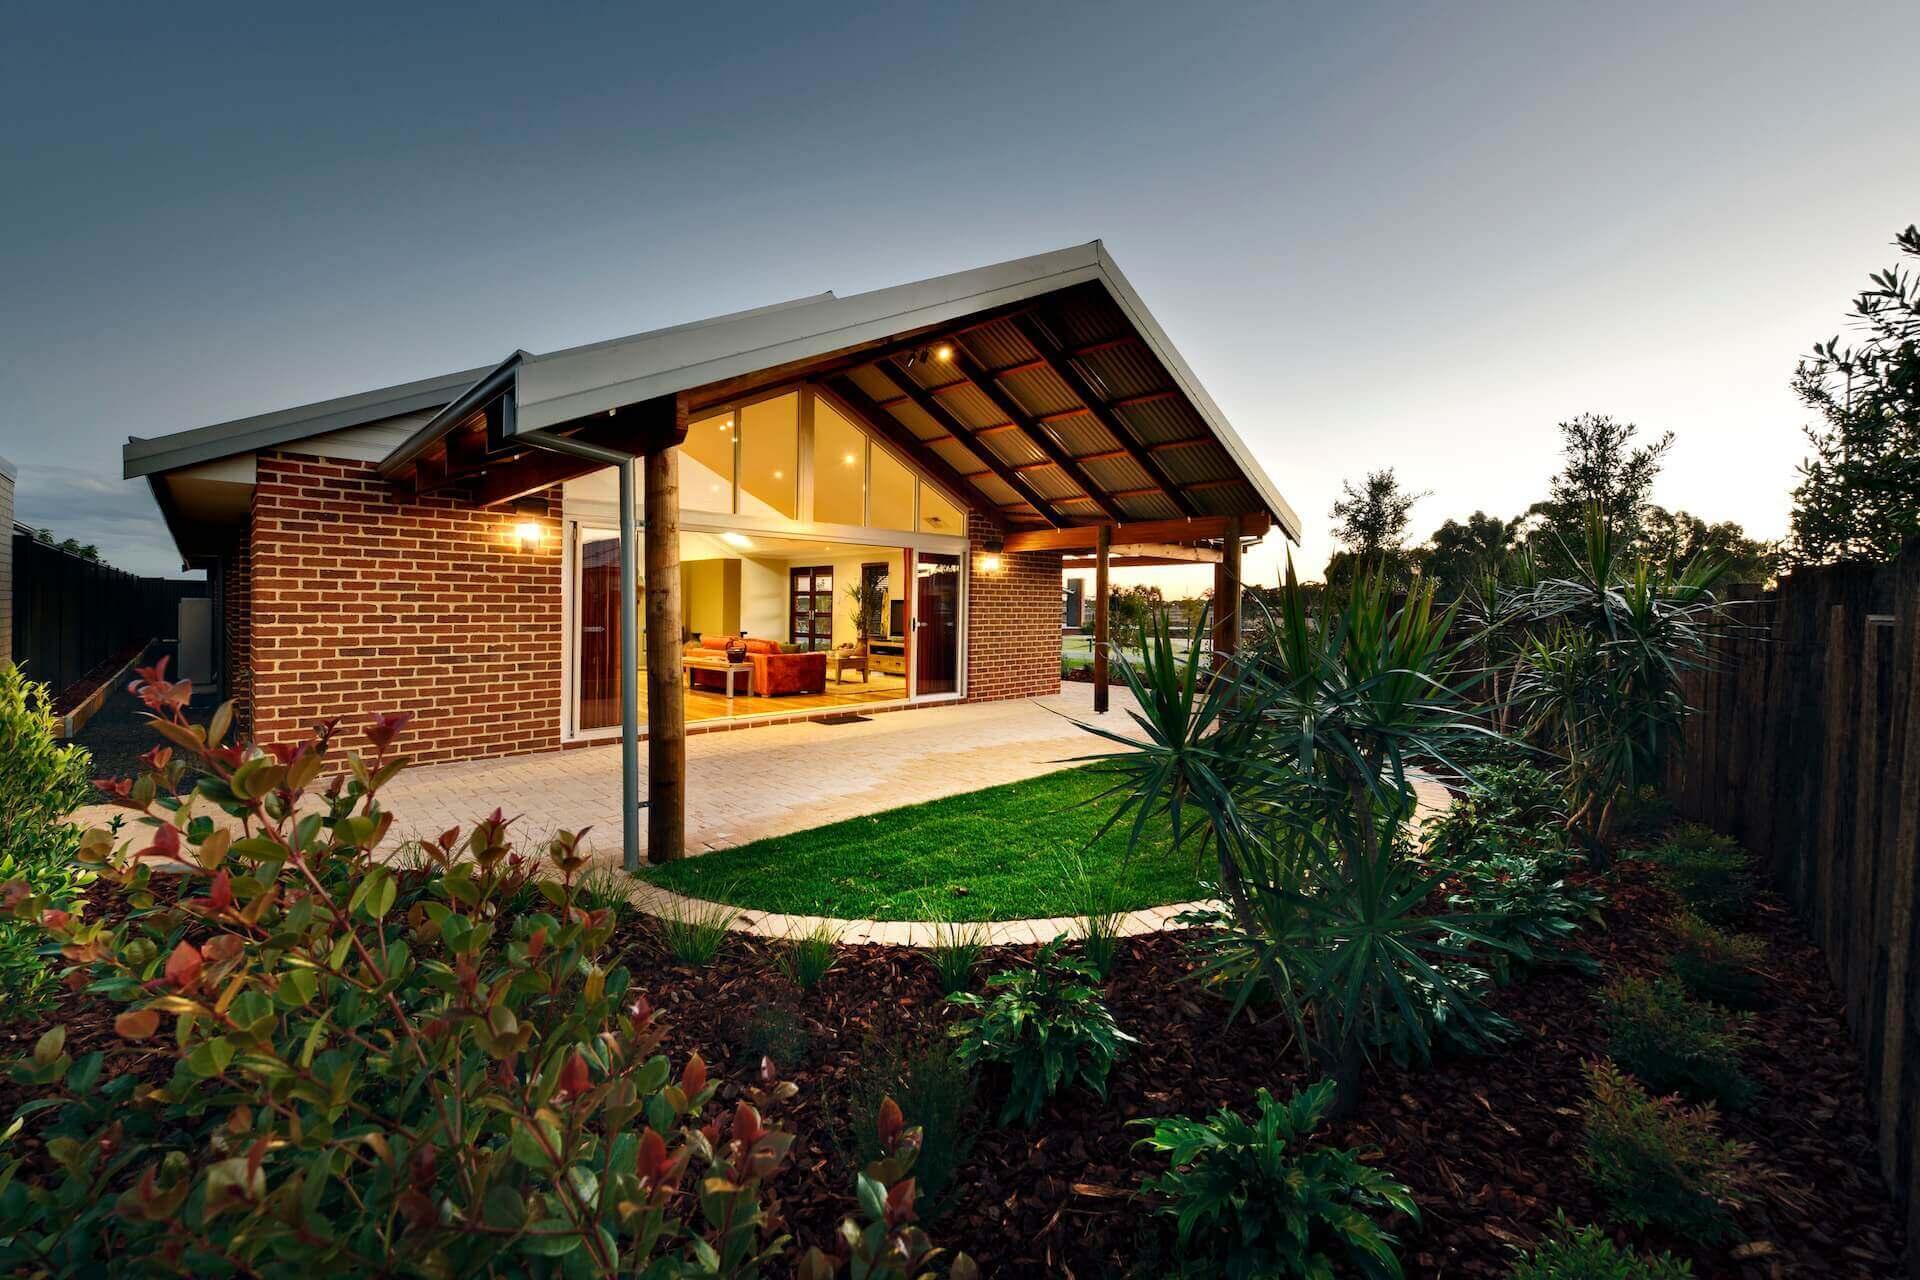 Rural Building Co - The Kingston traditional Australian homestead